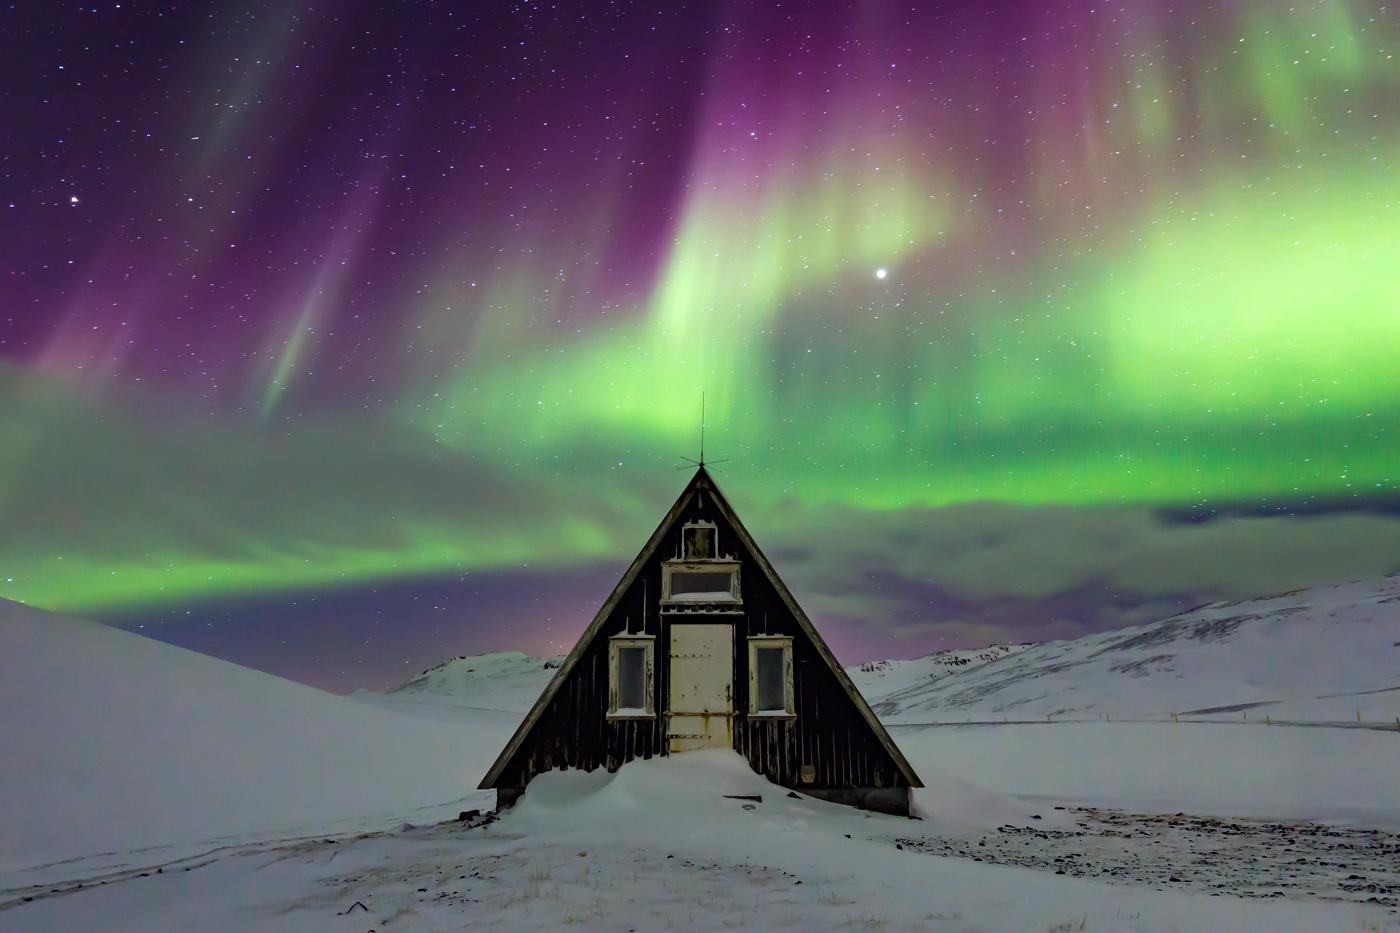 Aurora Borealis, Ólafsvík, Iceland